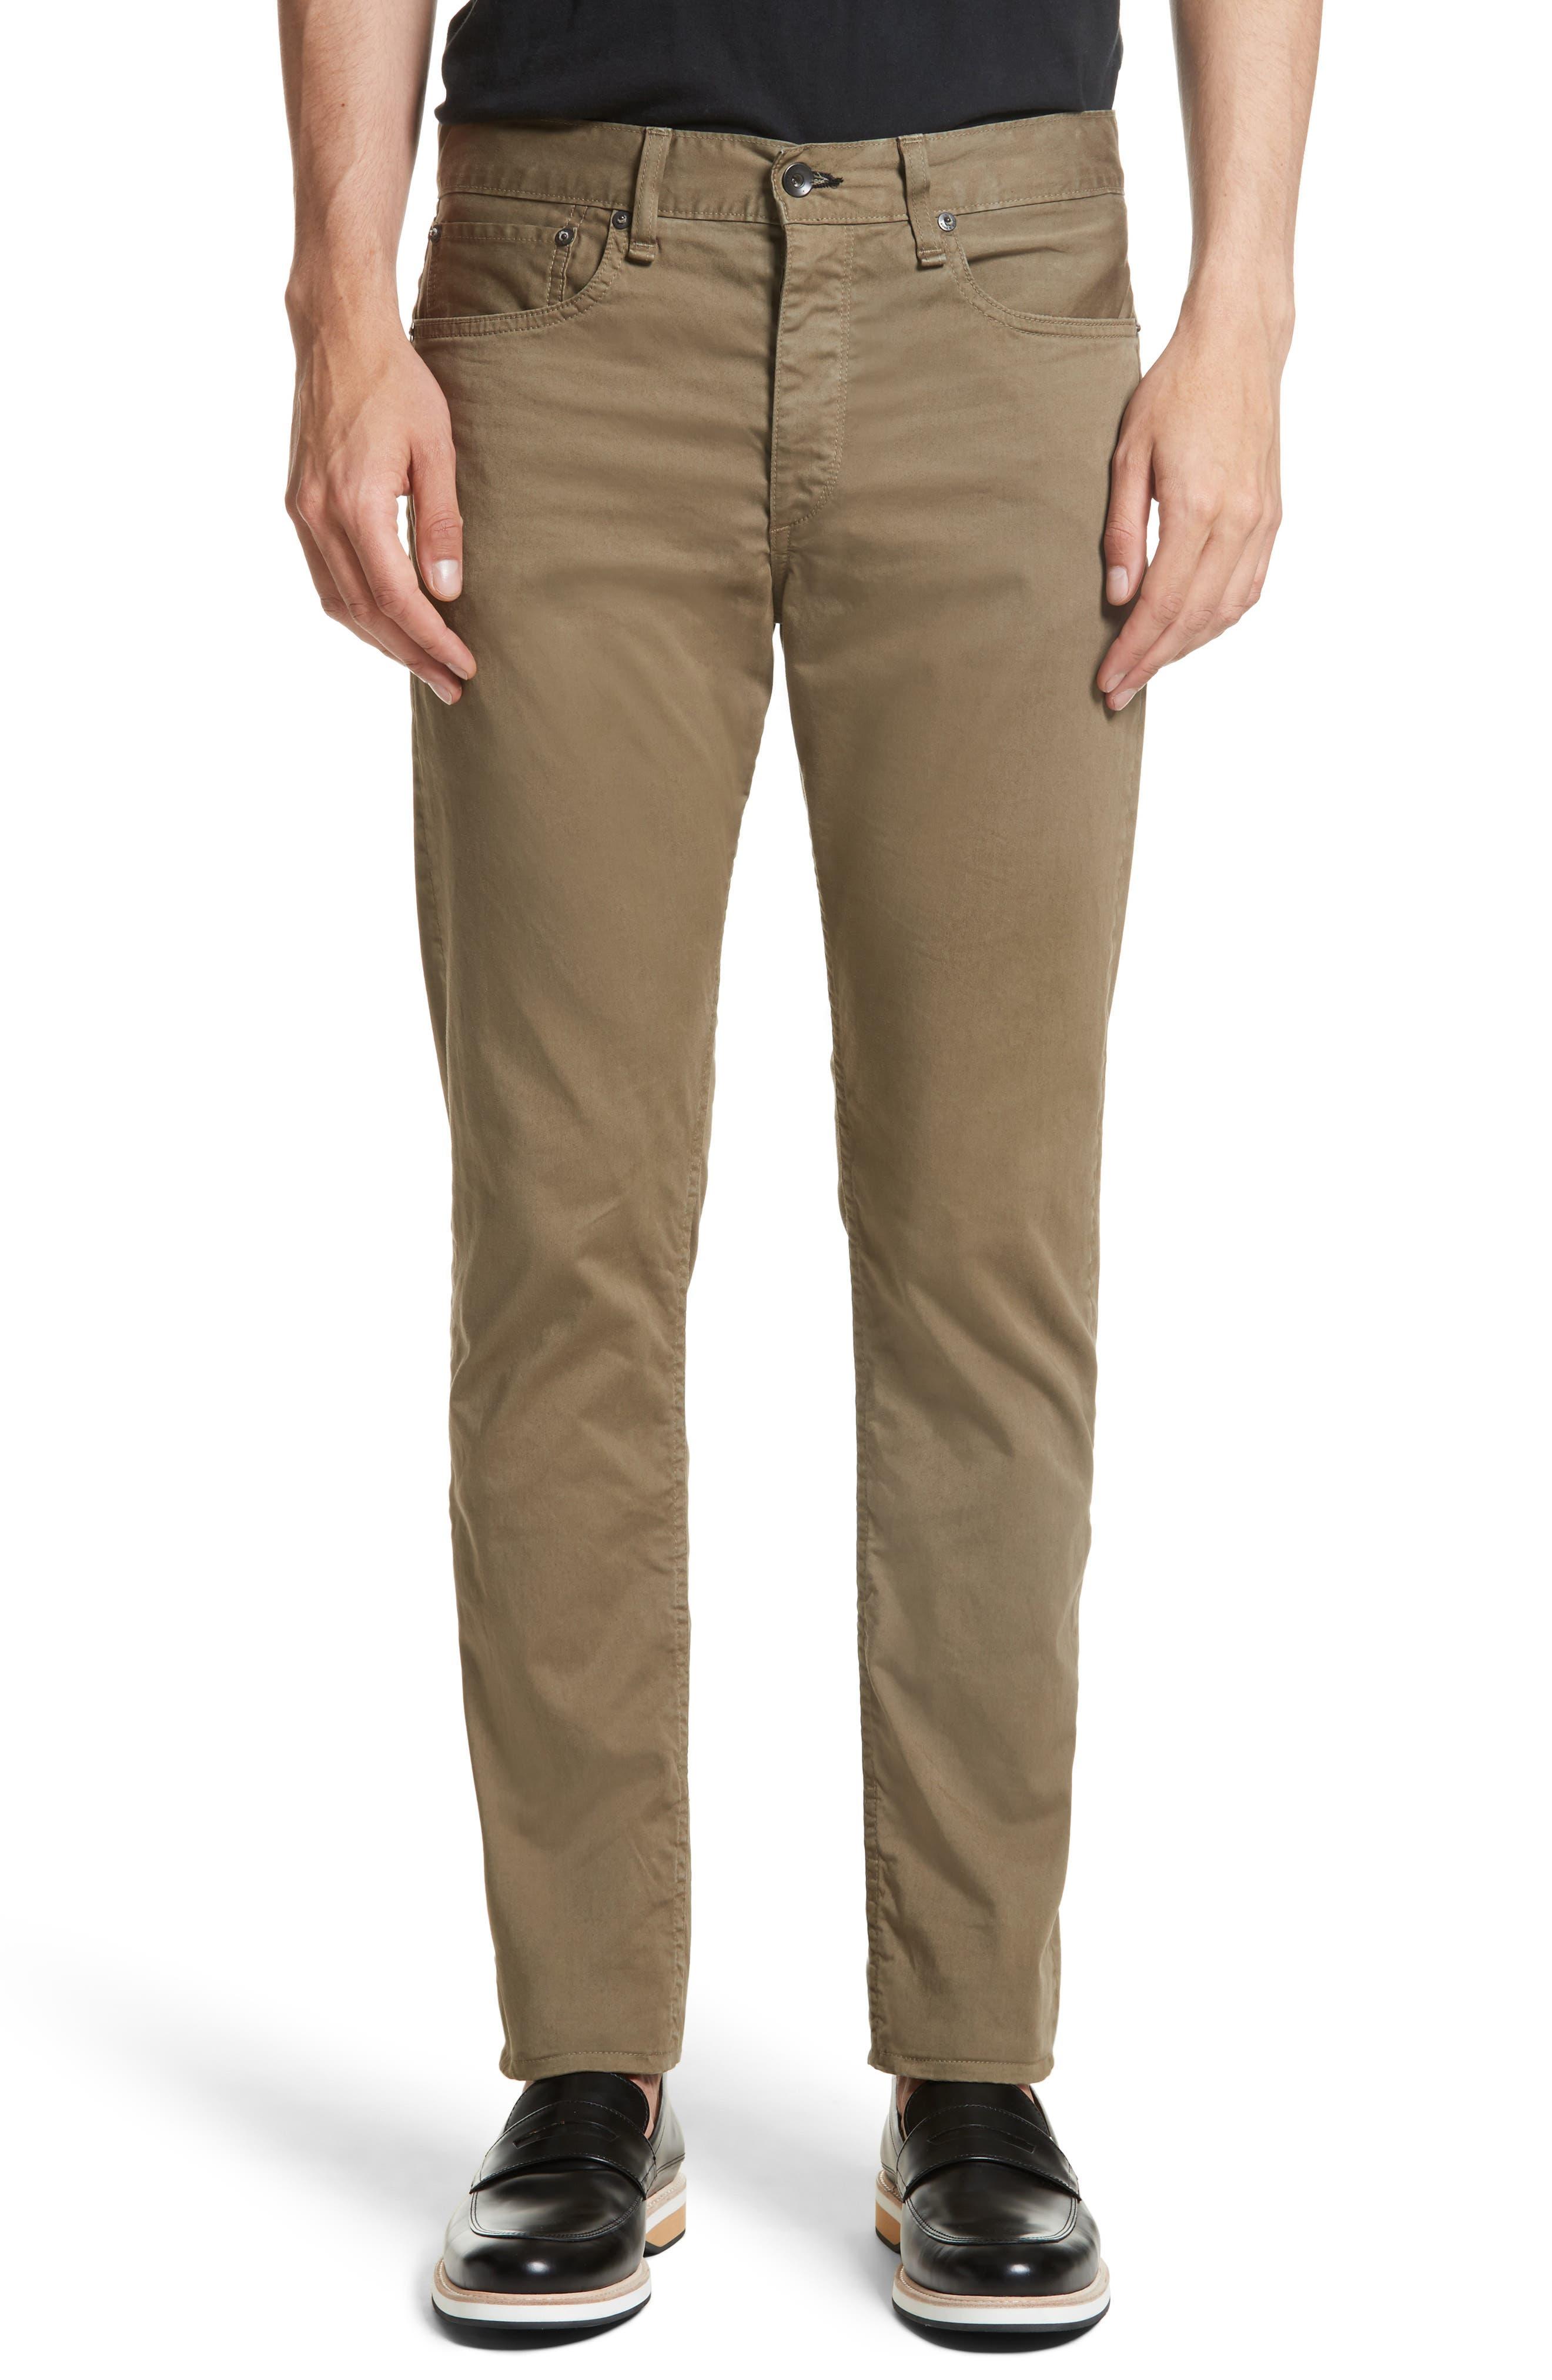 Fit 2 Five-Pocket Twill Pants,                         Main,                         color, 319